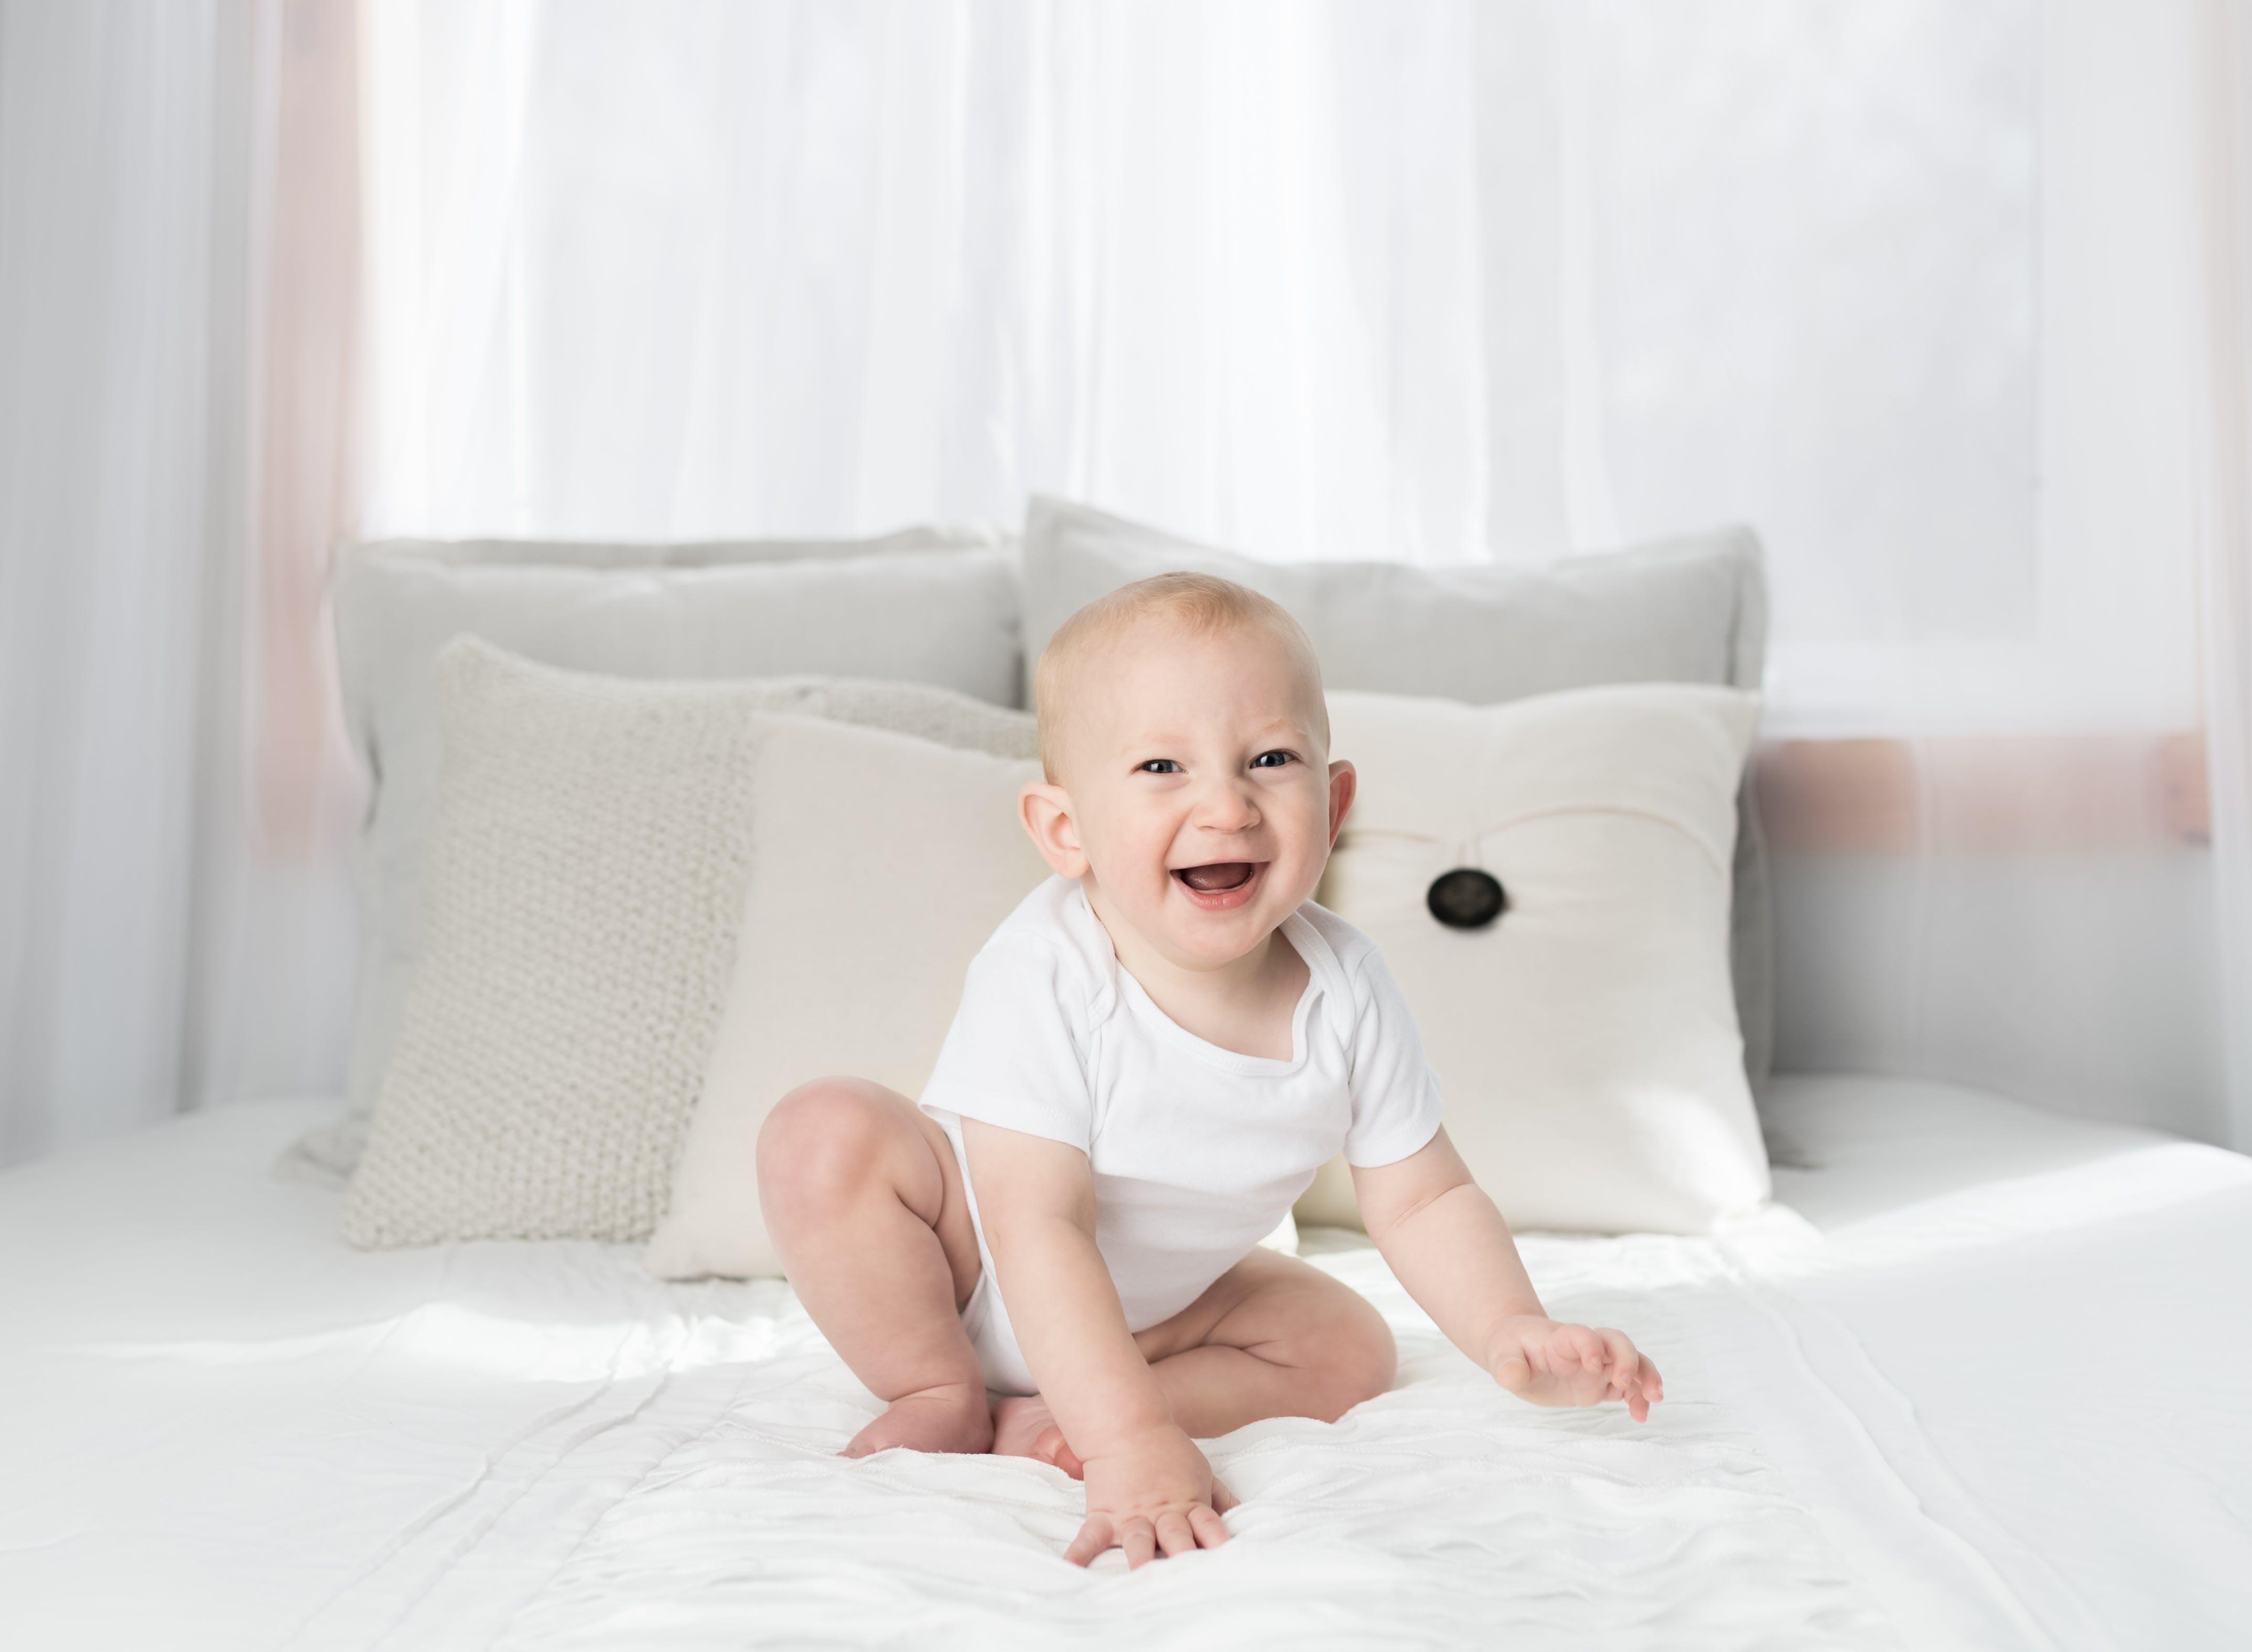 almofadas, bebê, cama